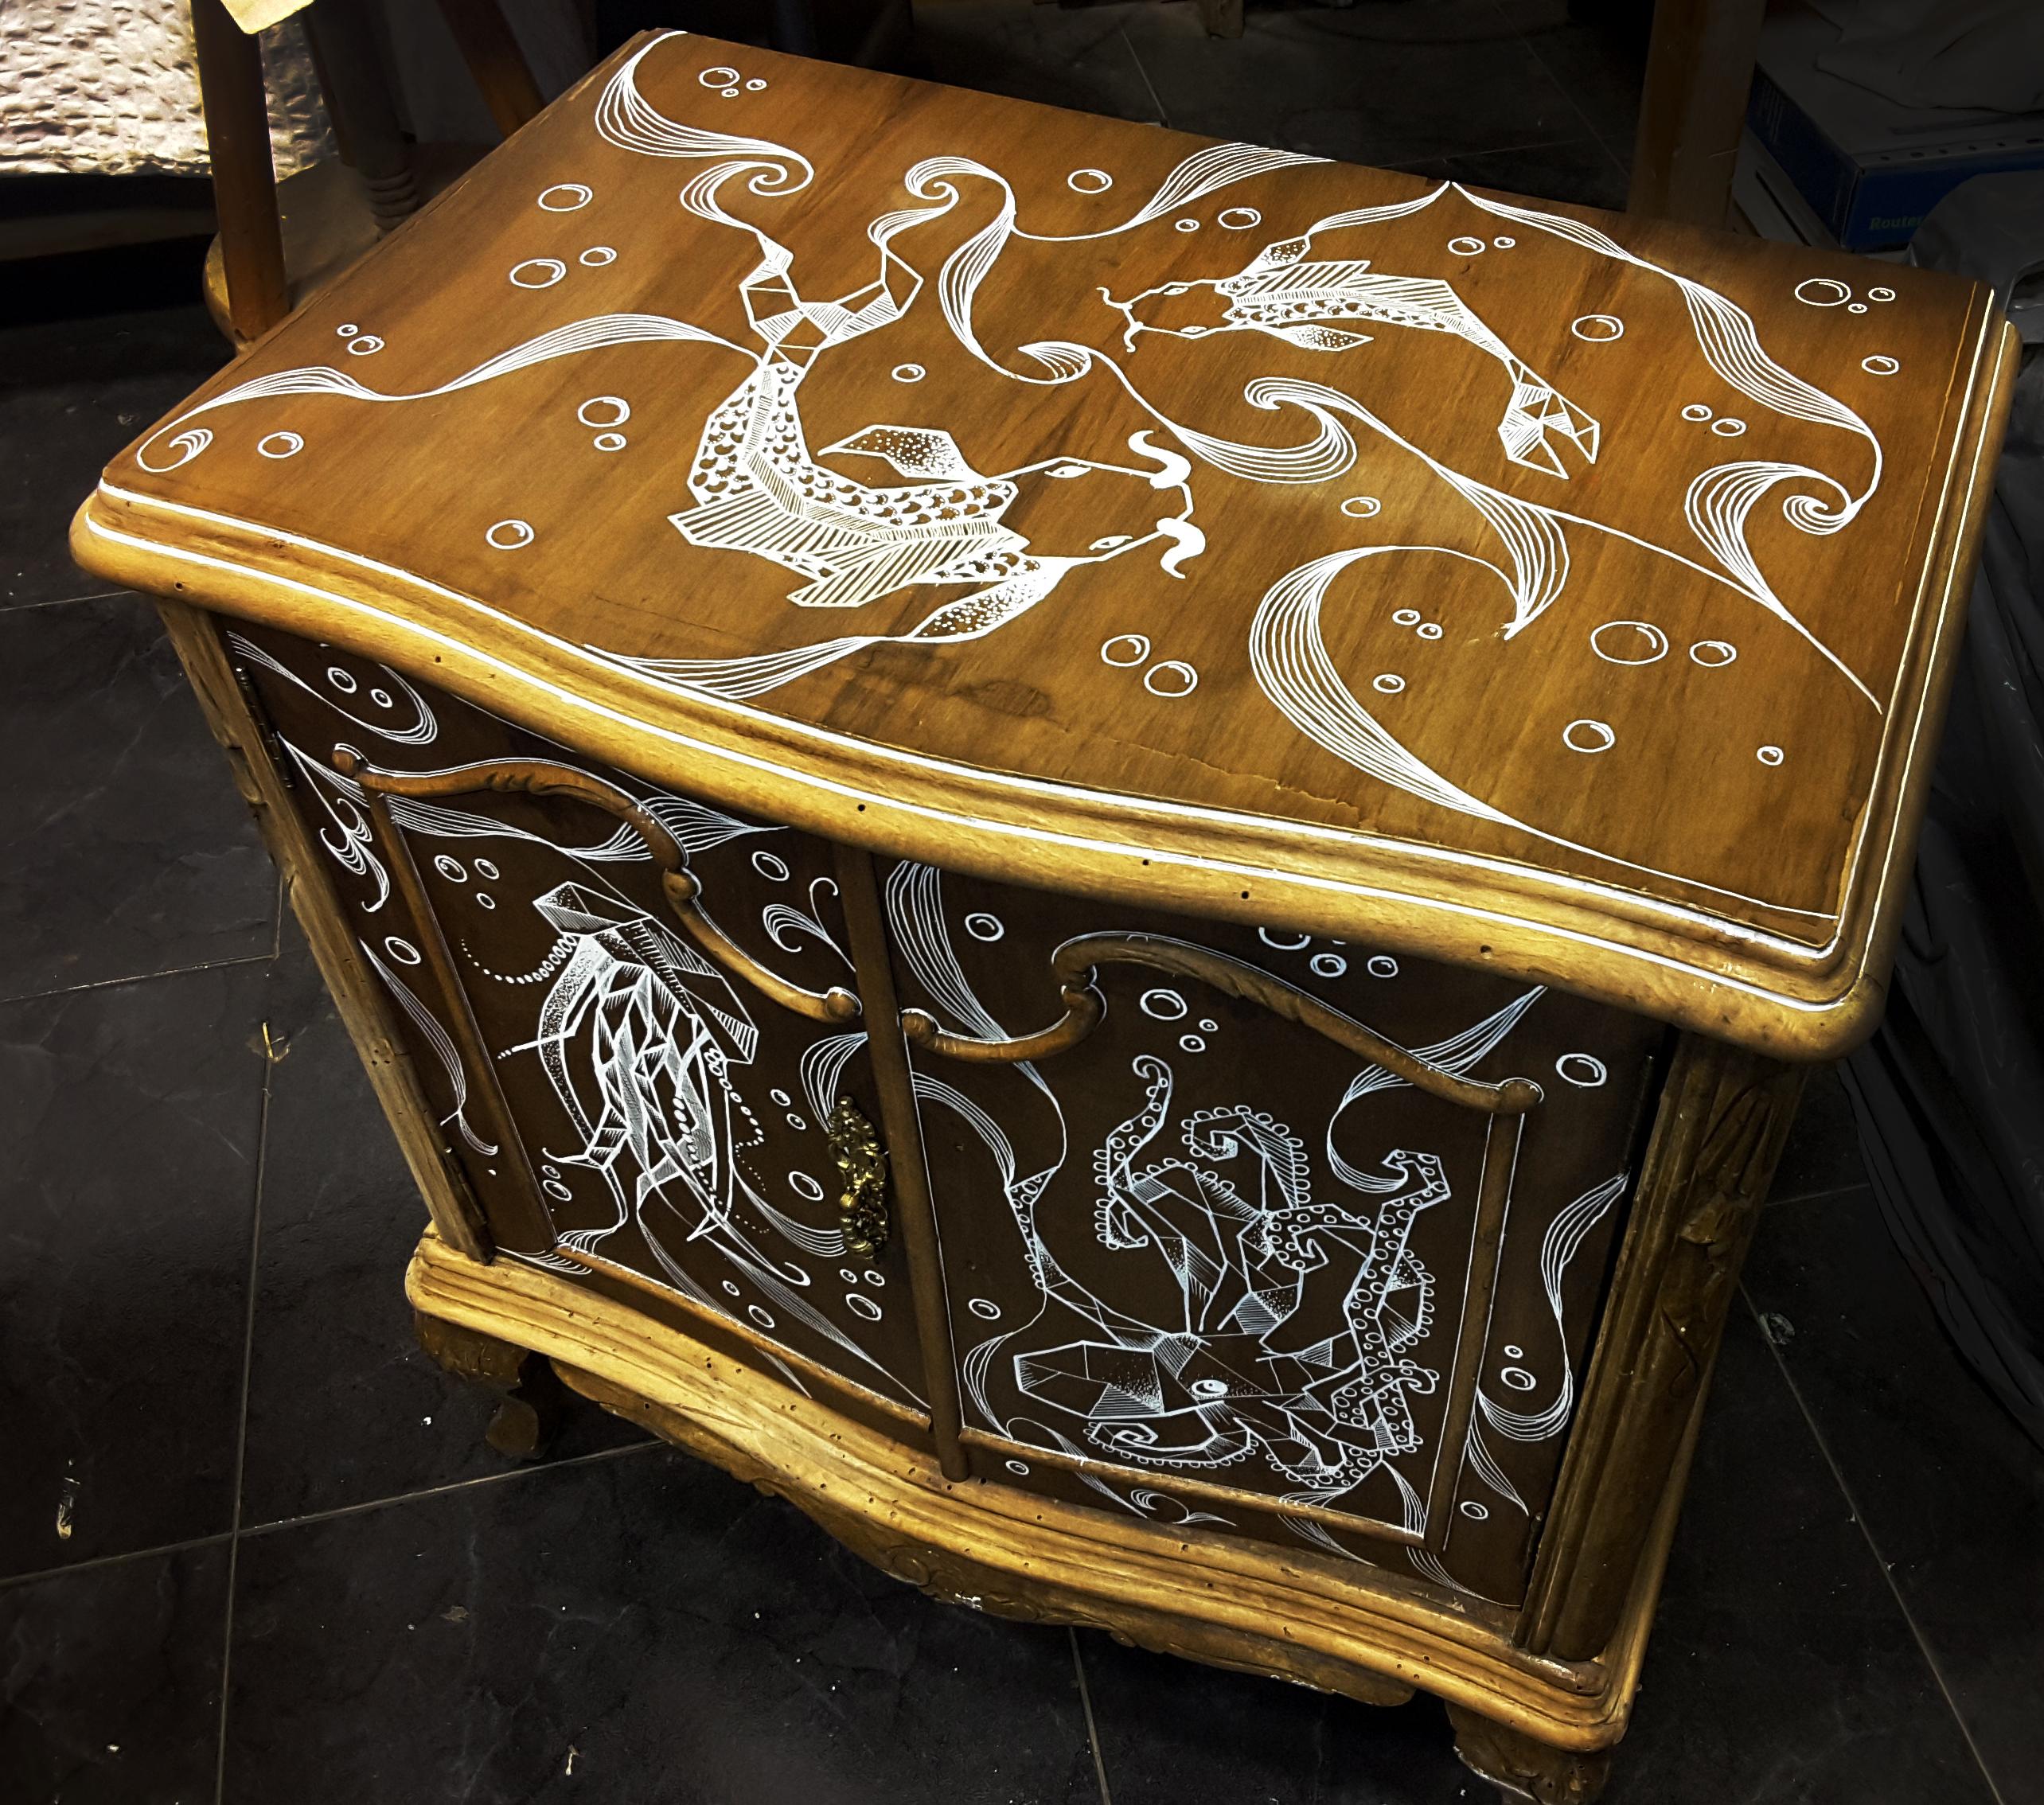 Hand drawn furniture